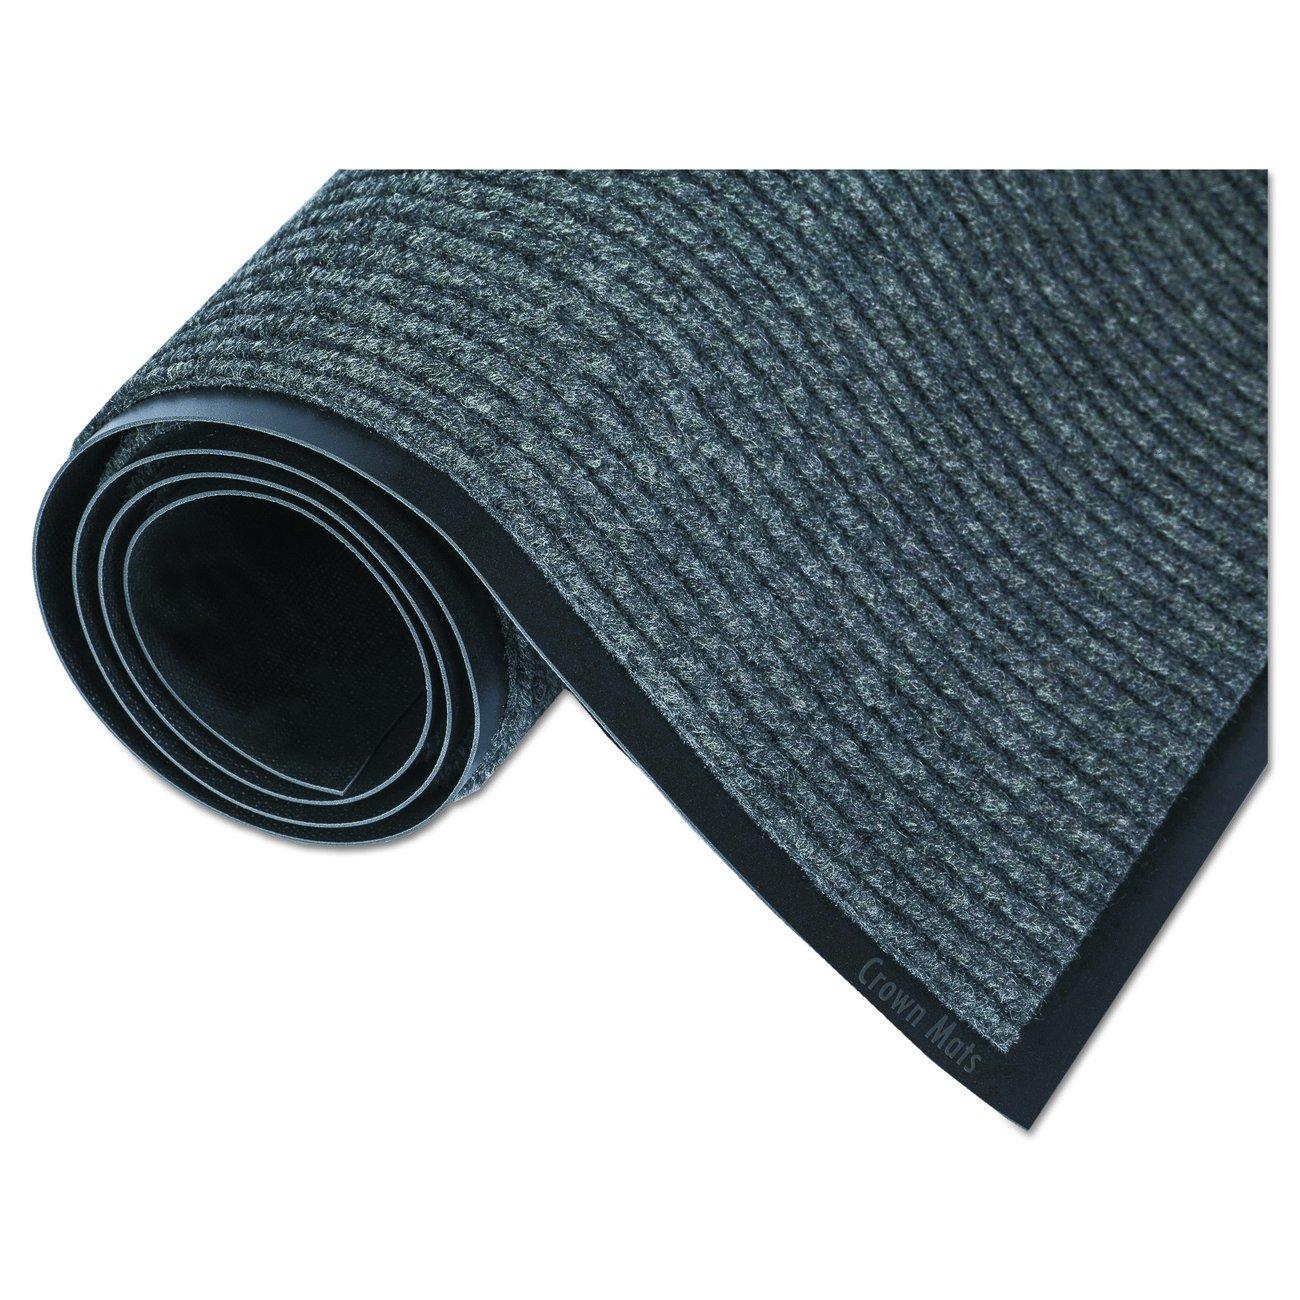 Crown NR0310GY Needle Rib Wipe Scrape Mat, Polypropylene, 36 x 120, Gray